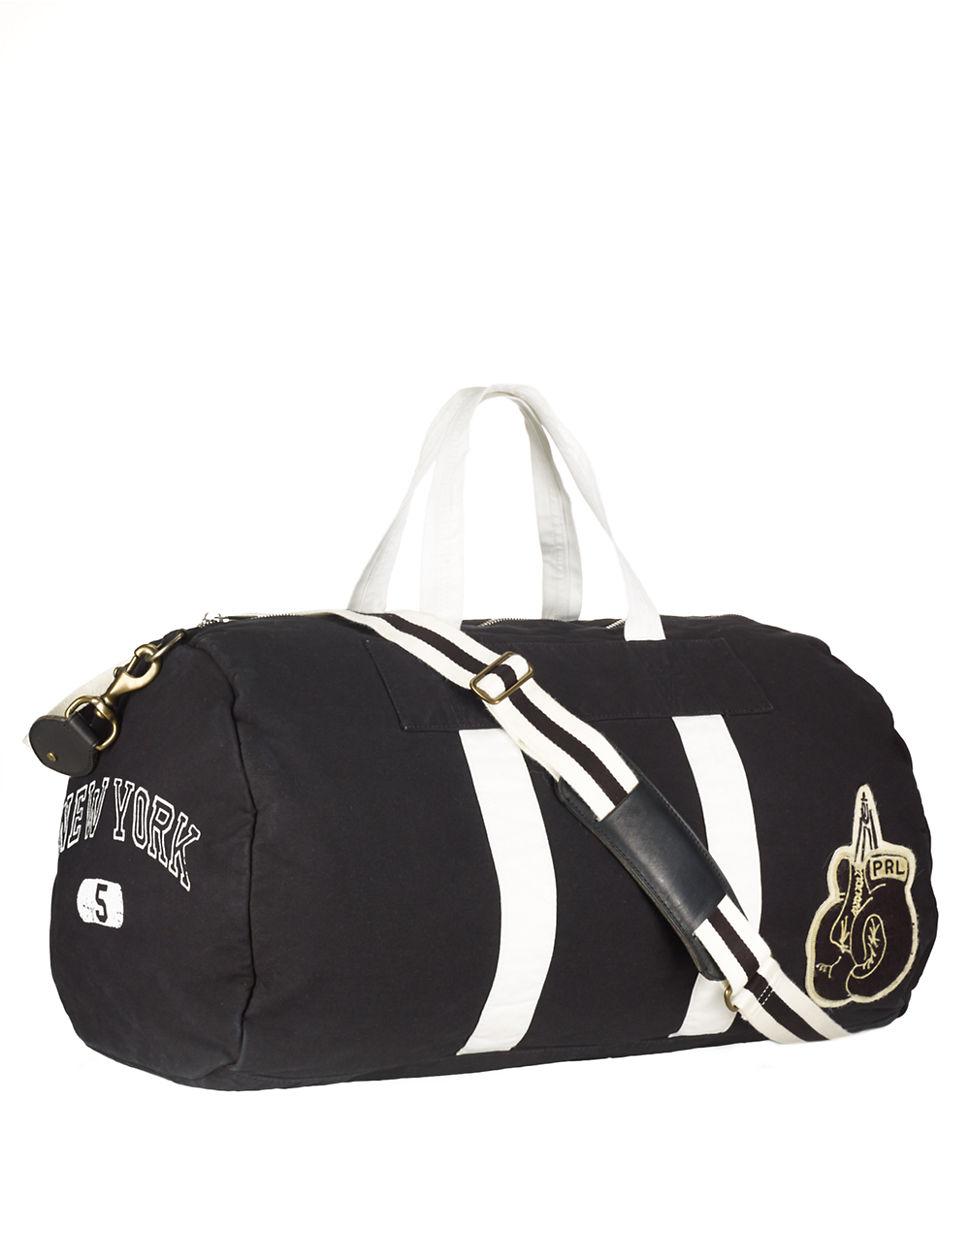 Polo Ralph Lauren Canvas Boxing Duffel Bag in Black for Men - Lyst b930a98f07a19